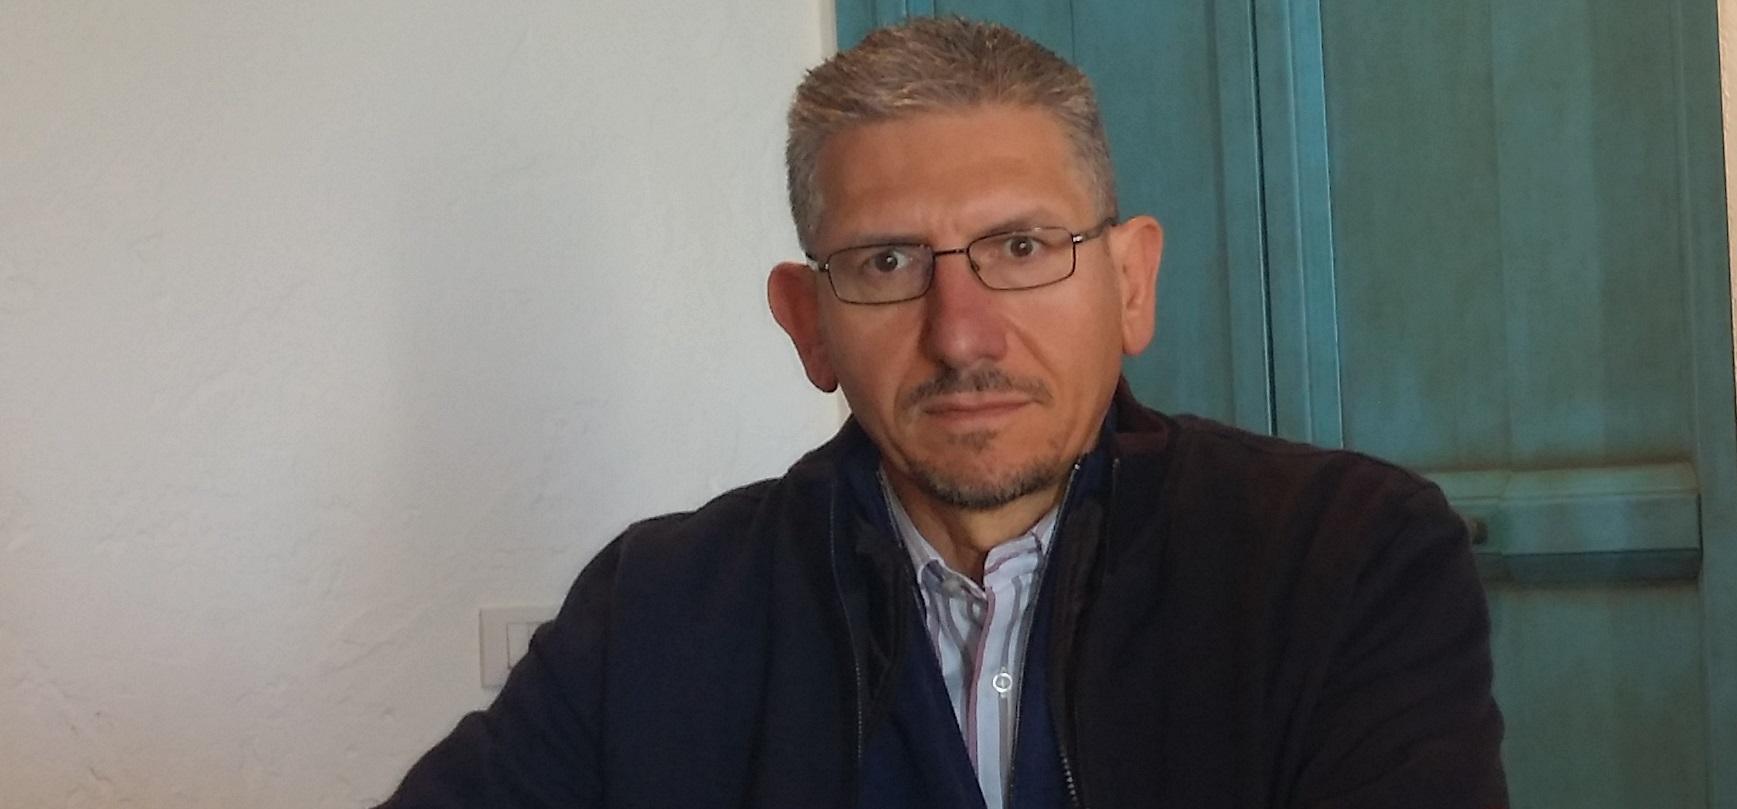 Amedeo Bianchi